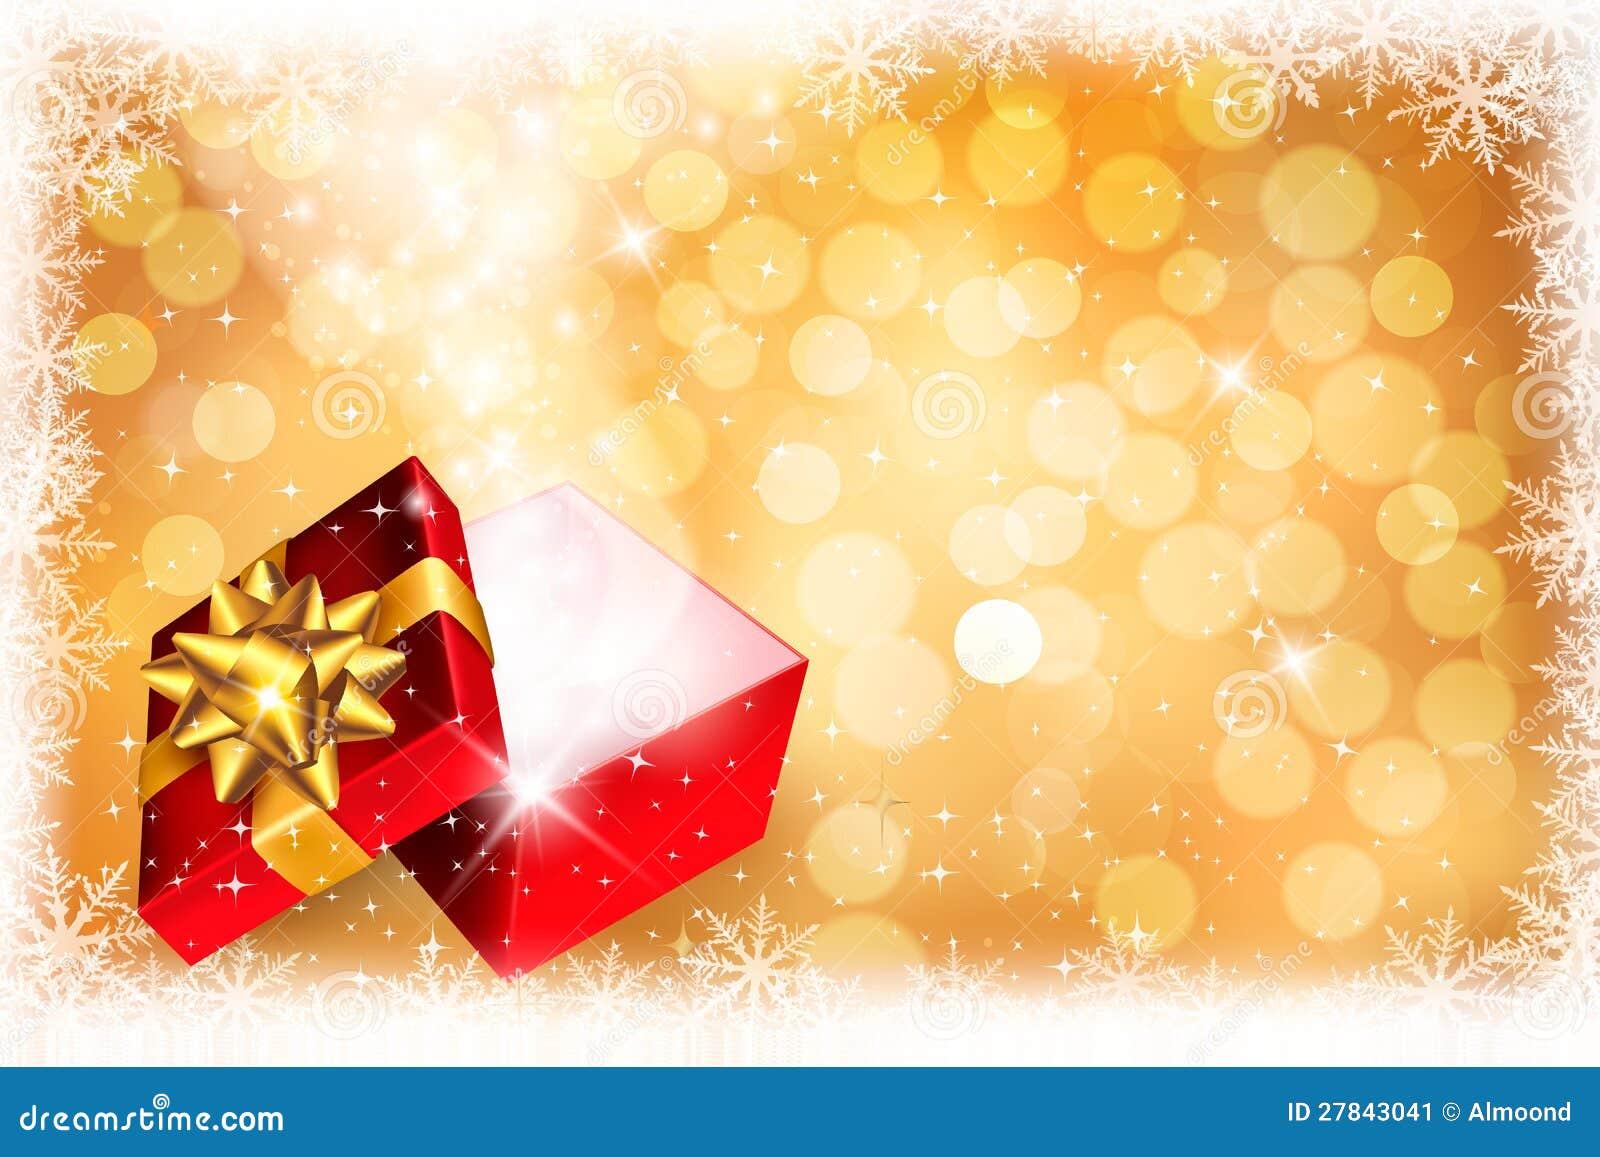 Christmas Background Stock Vector Illustration Of Beautiful